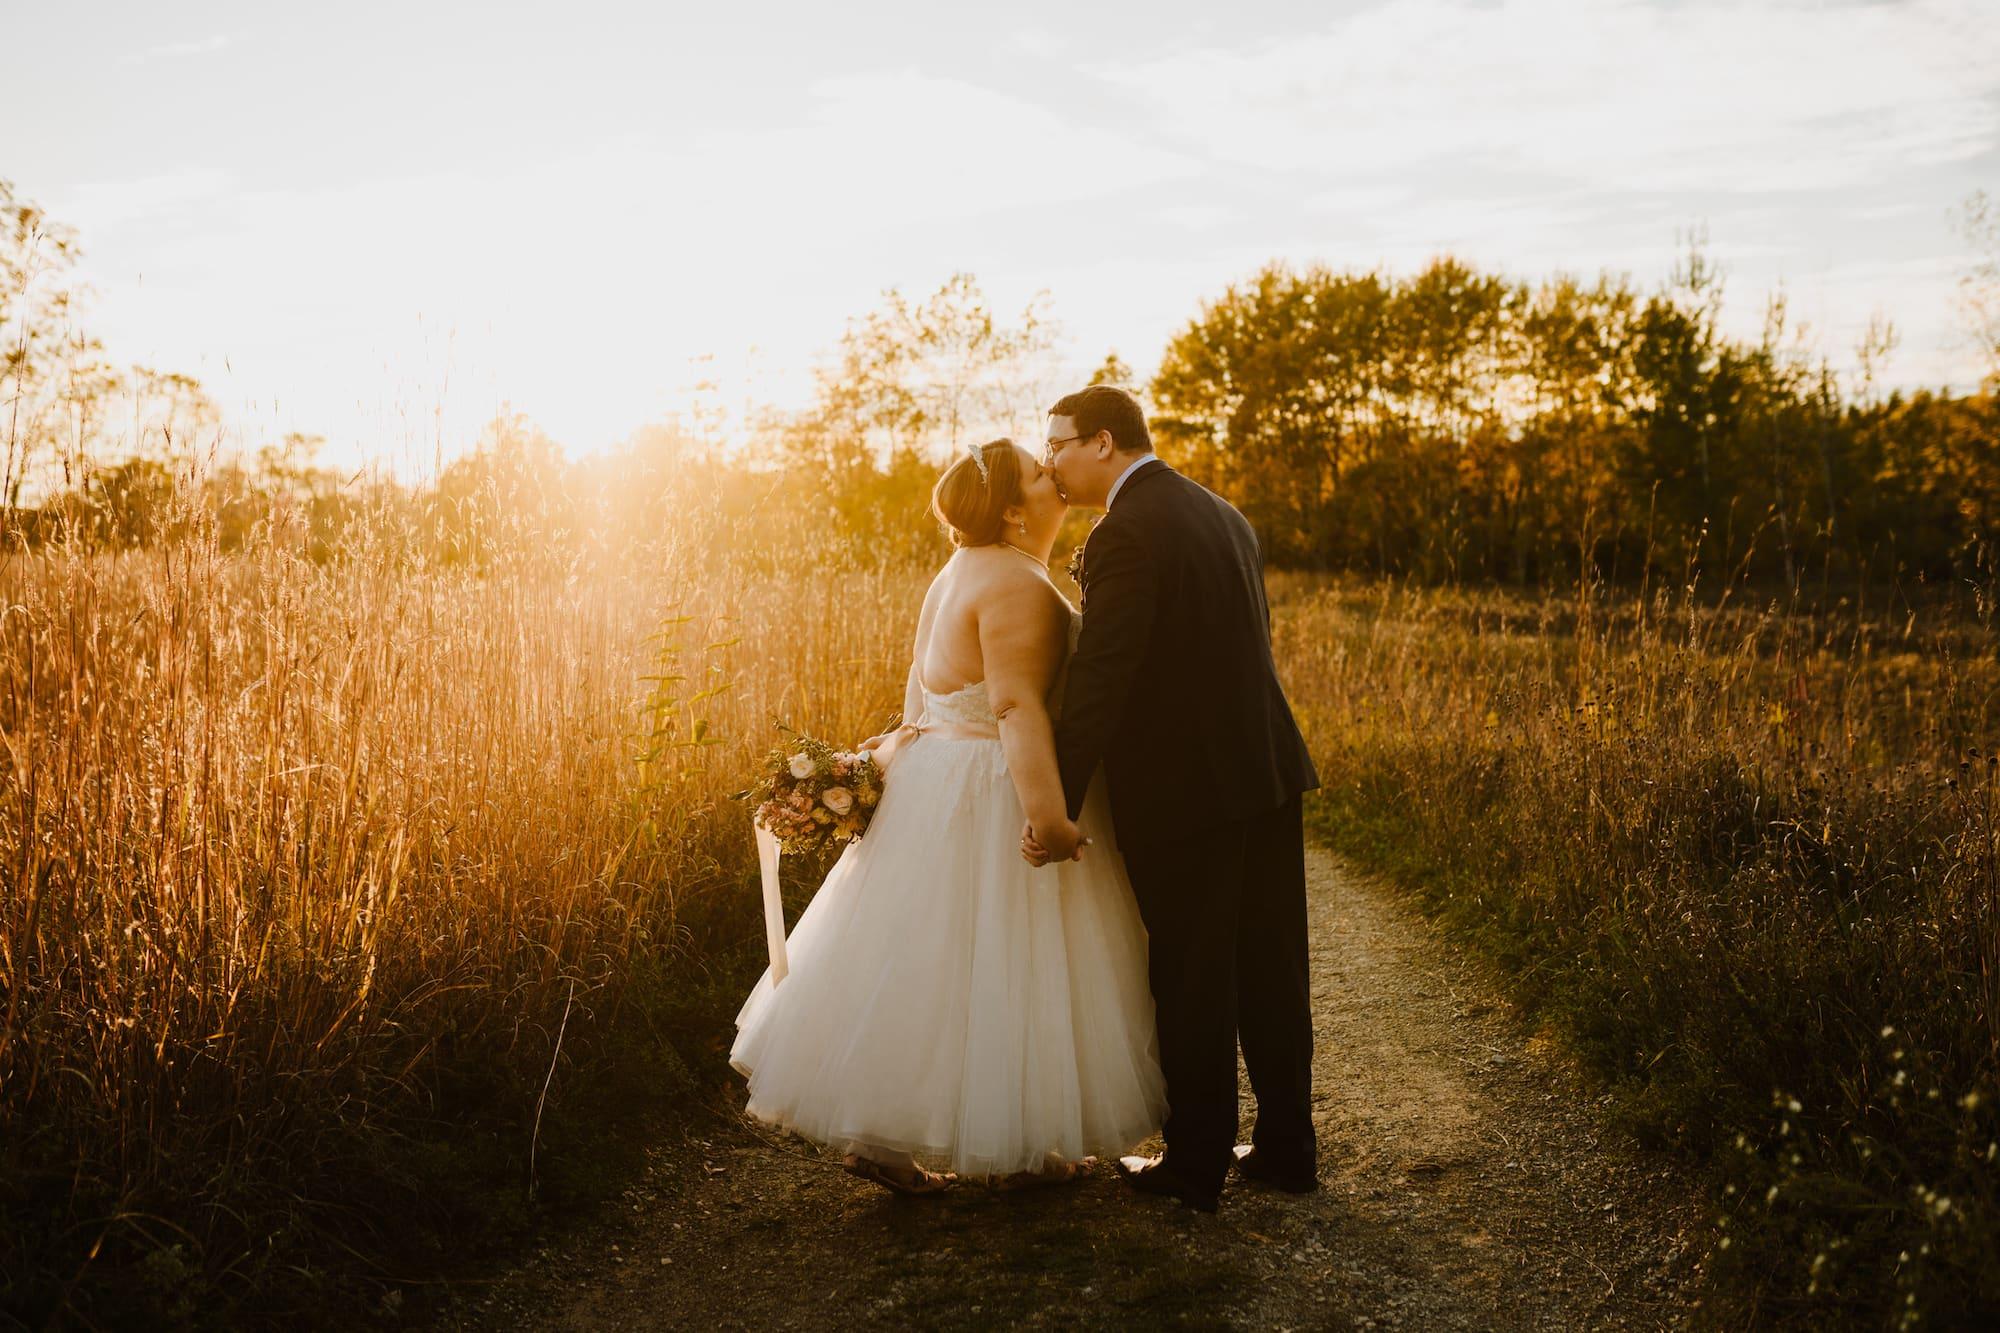 Indian Springs Metropark Wedding | Cory & Brian